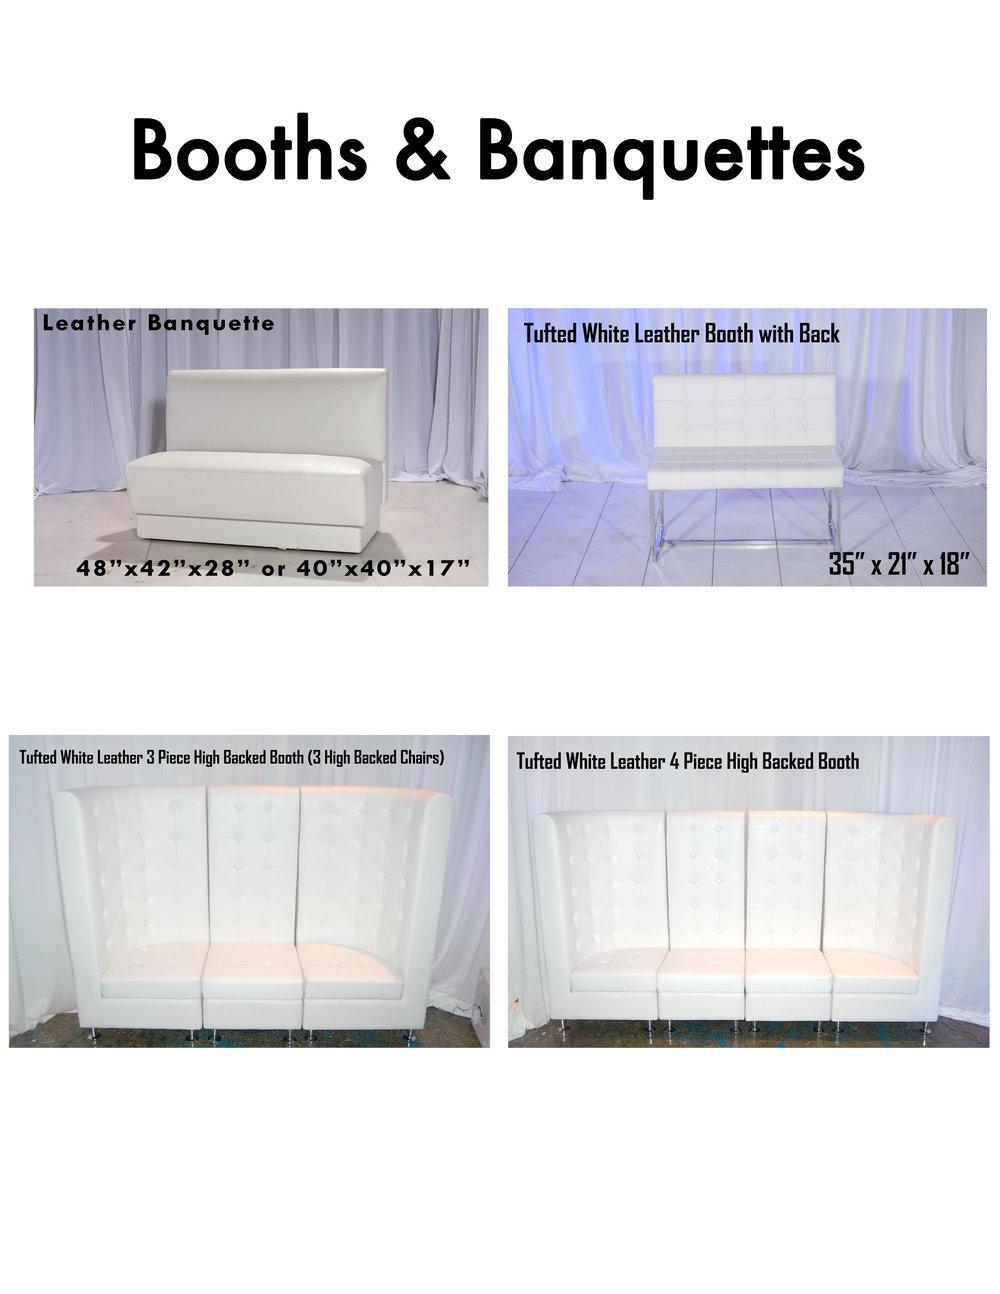 039-P38_Booths & Banquettes.jpg